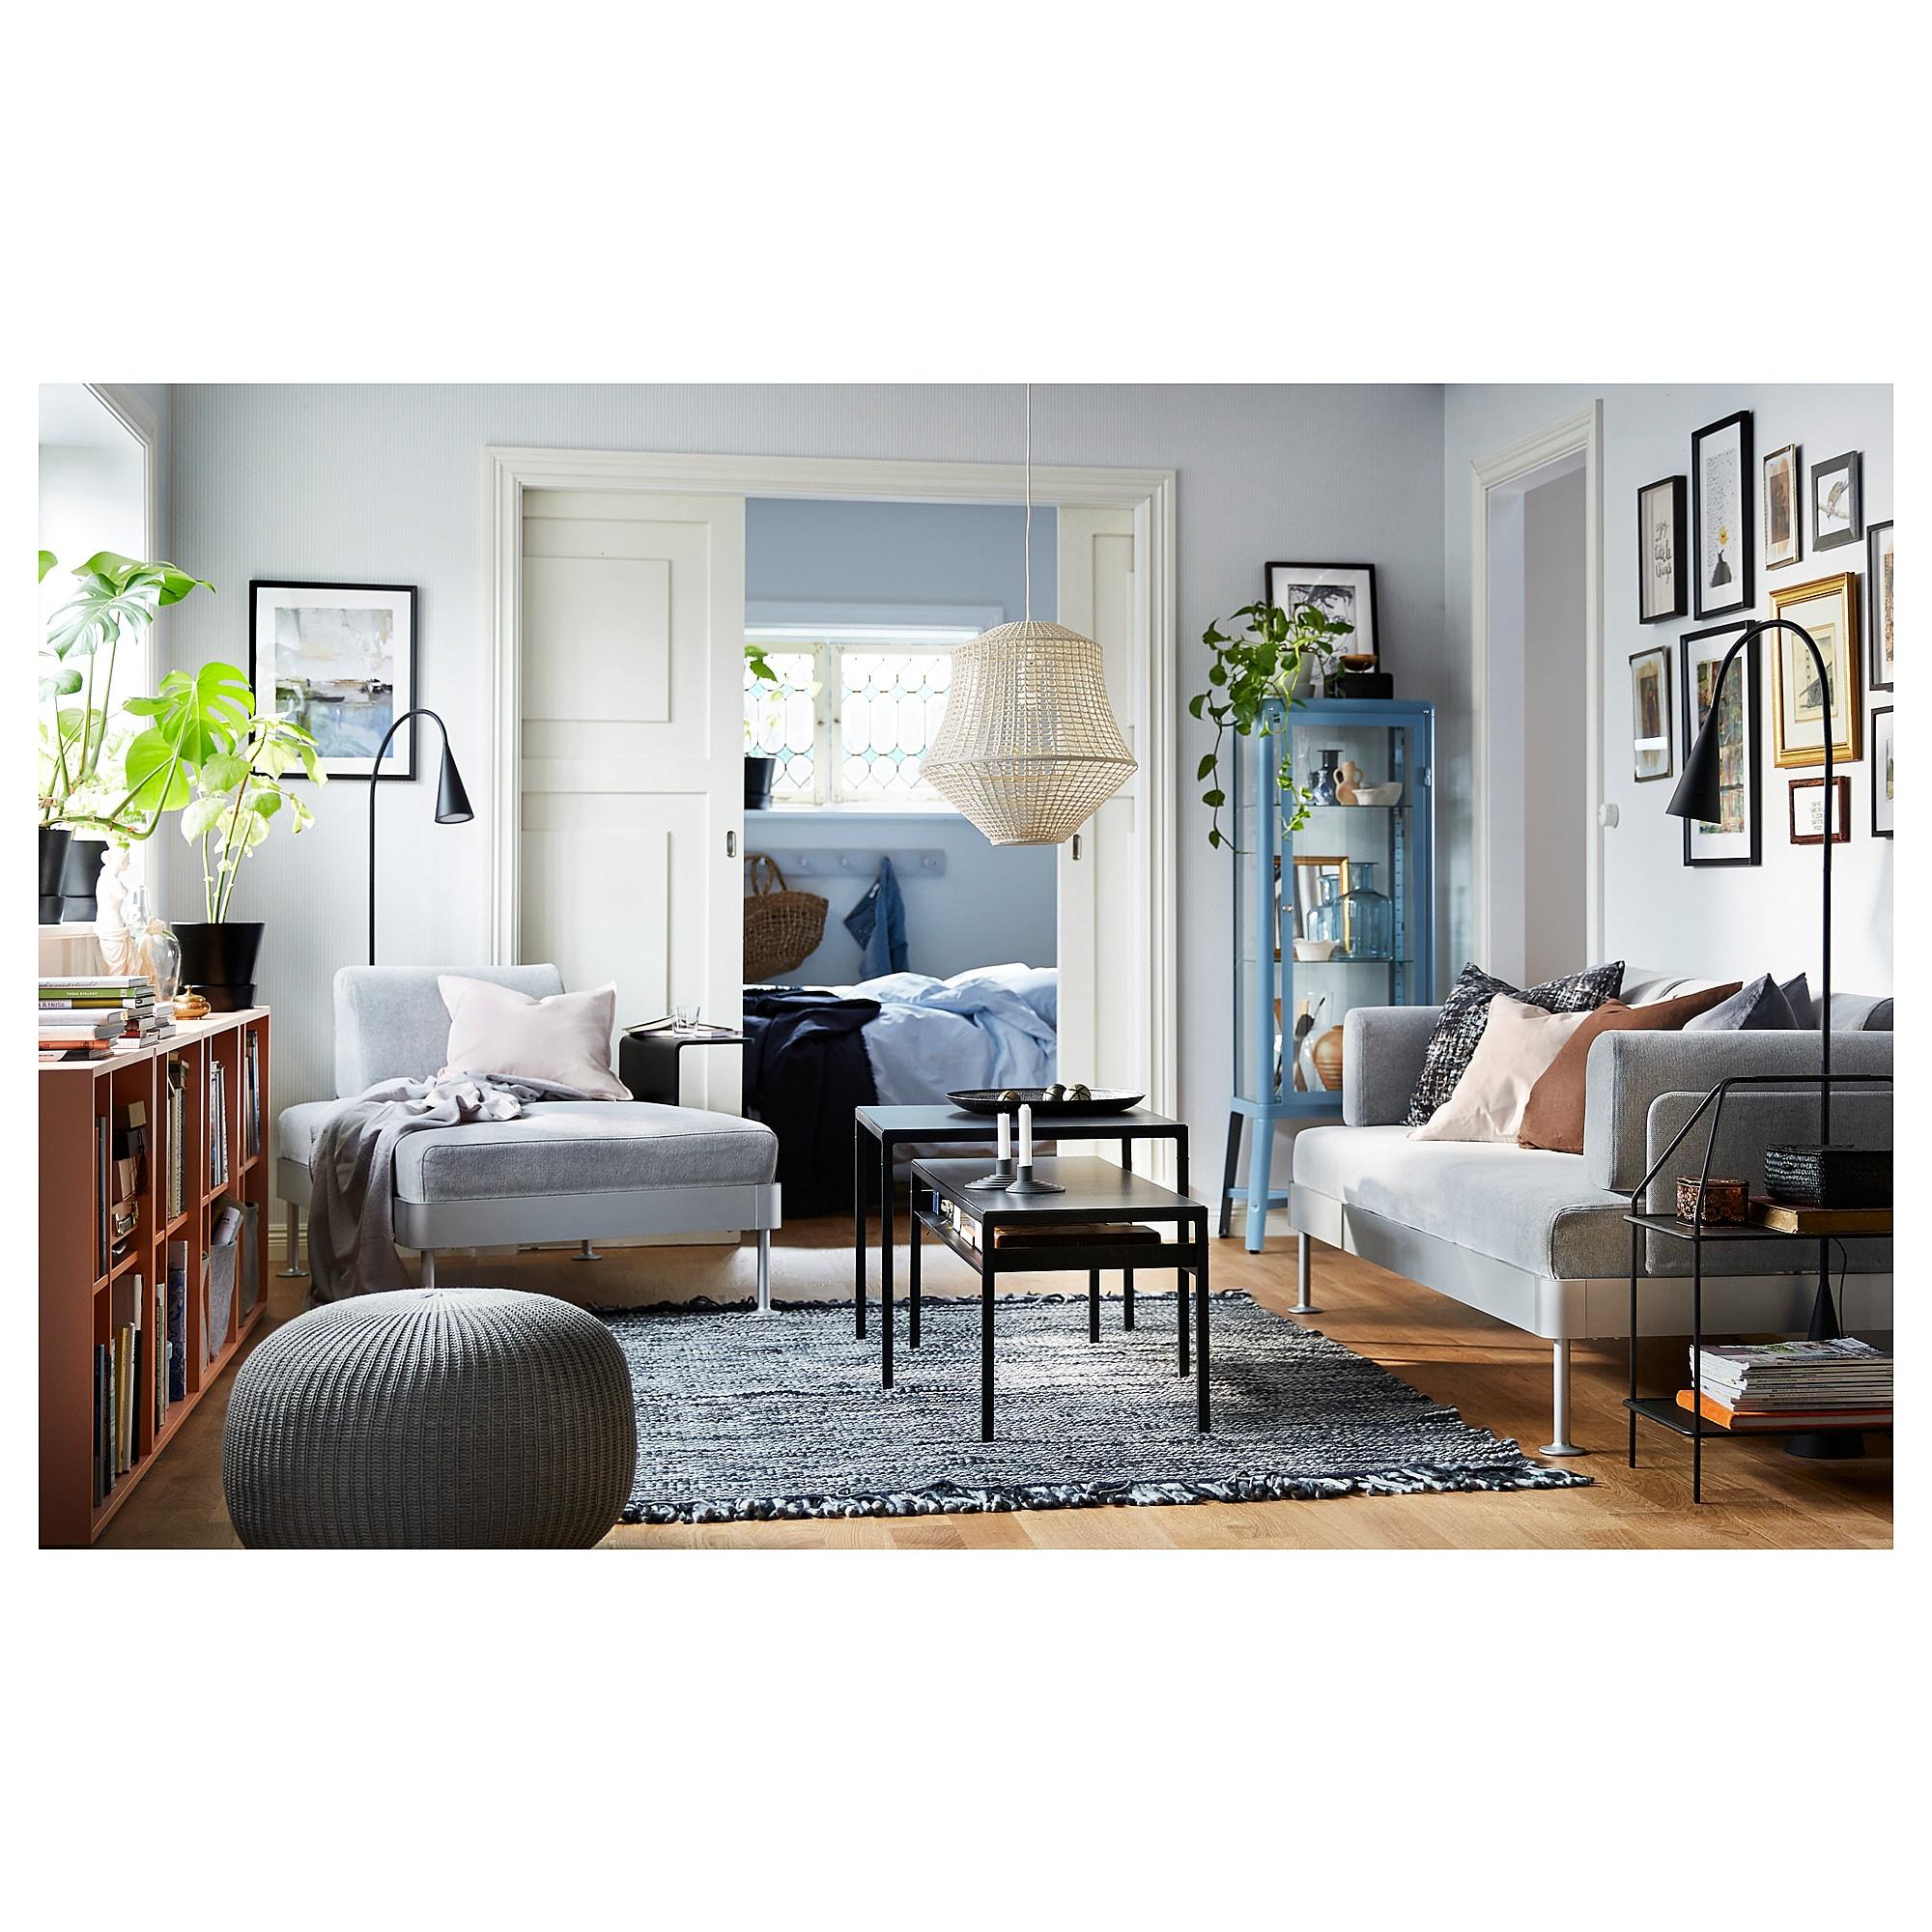 Mobili Bassi Cucina Ikea furniture and home furnishings